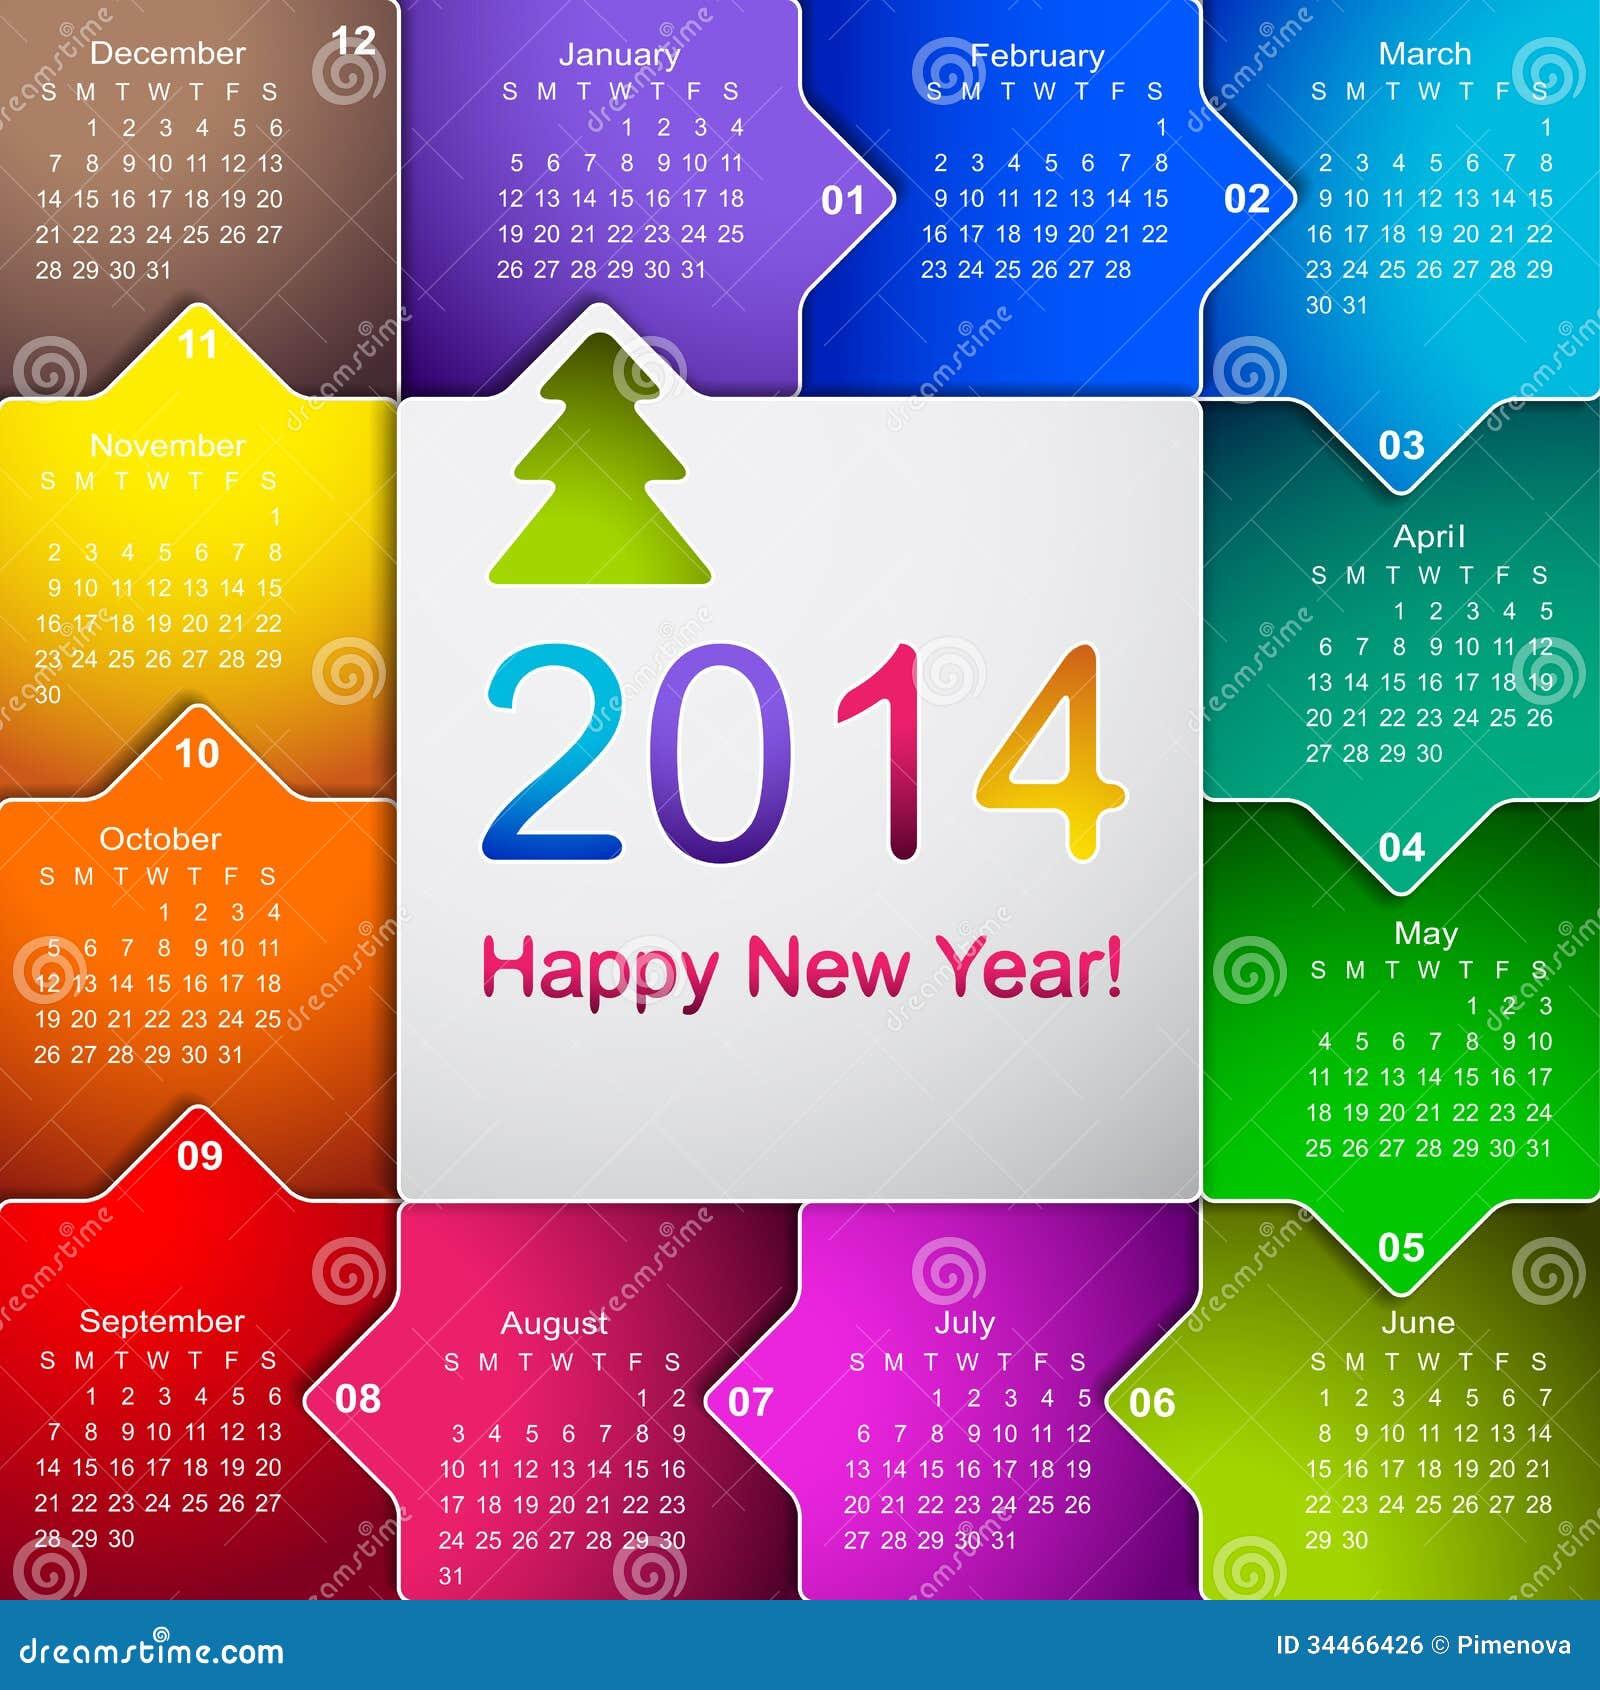 corporate wall calendar